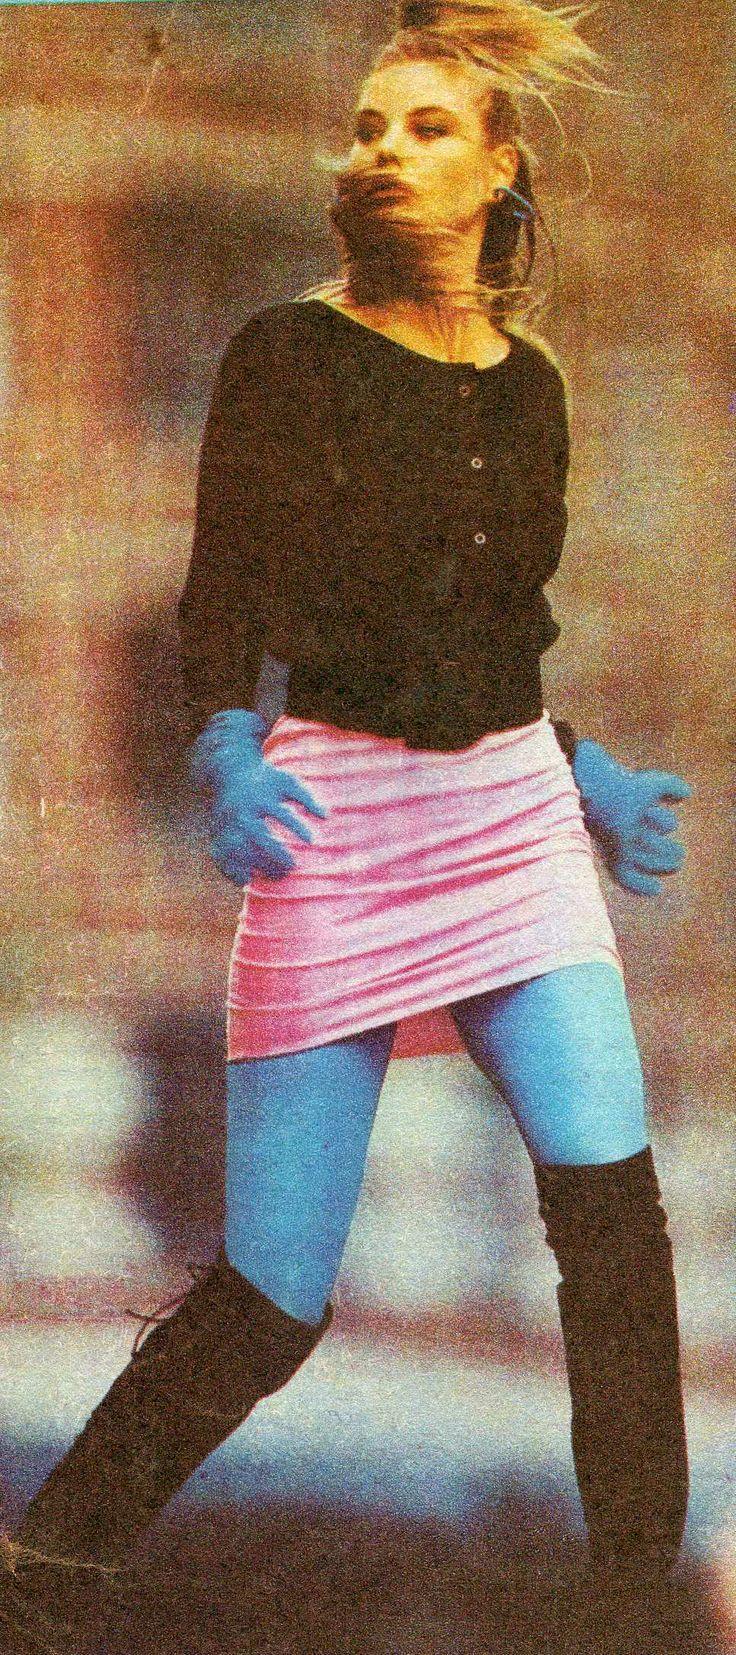 "from ""tylko dla ciebie"" wydawnictwo specjalne ""ŚWIATA MODY"" nr 1 '1988  models reprint from Harper's Bazar, Brigitte, Elle, Freundin, Annabella, Grazia."